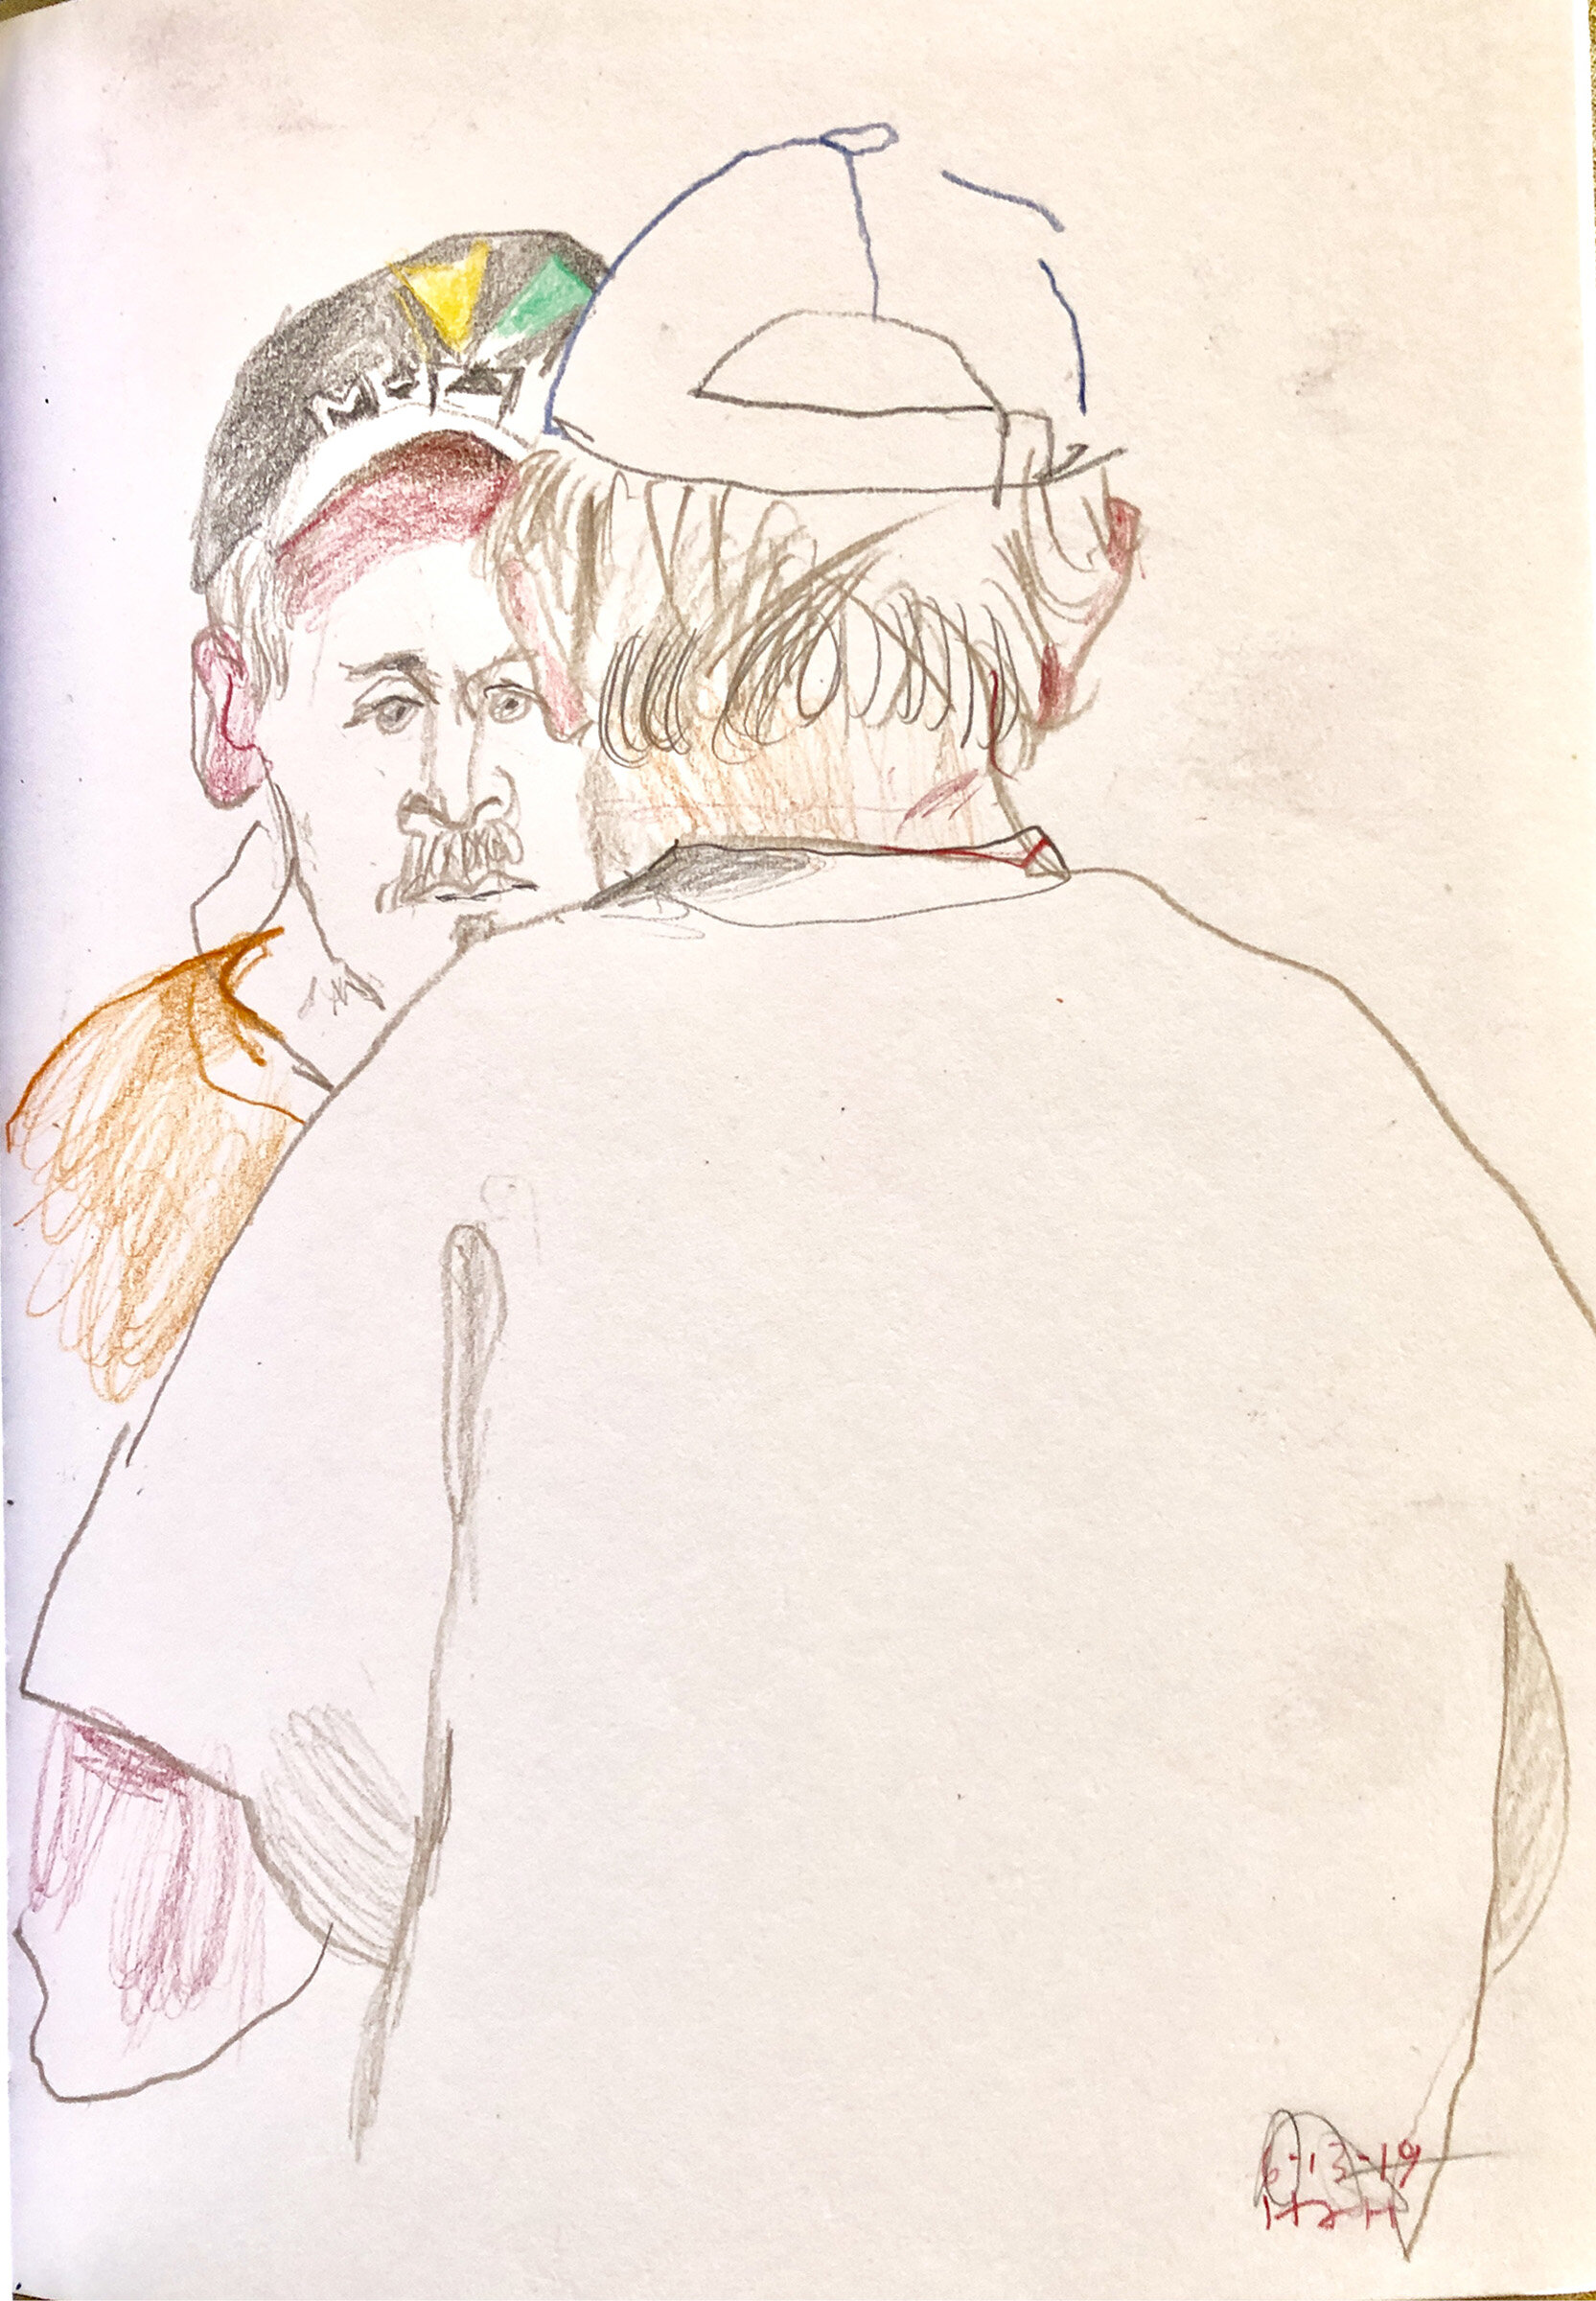 SITE-6-13-19 H&H drawing 3.jpg